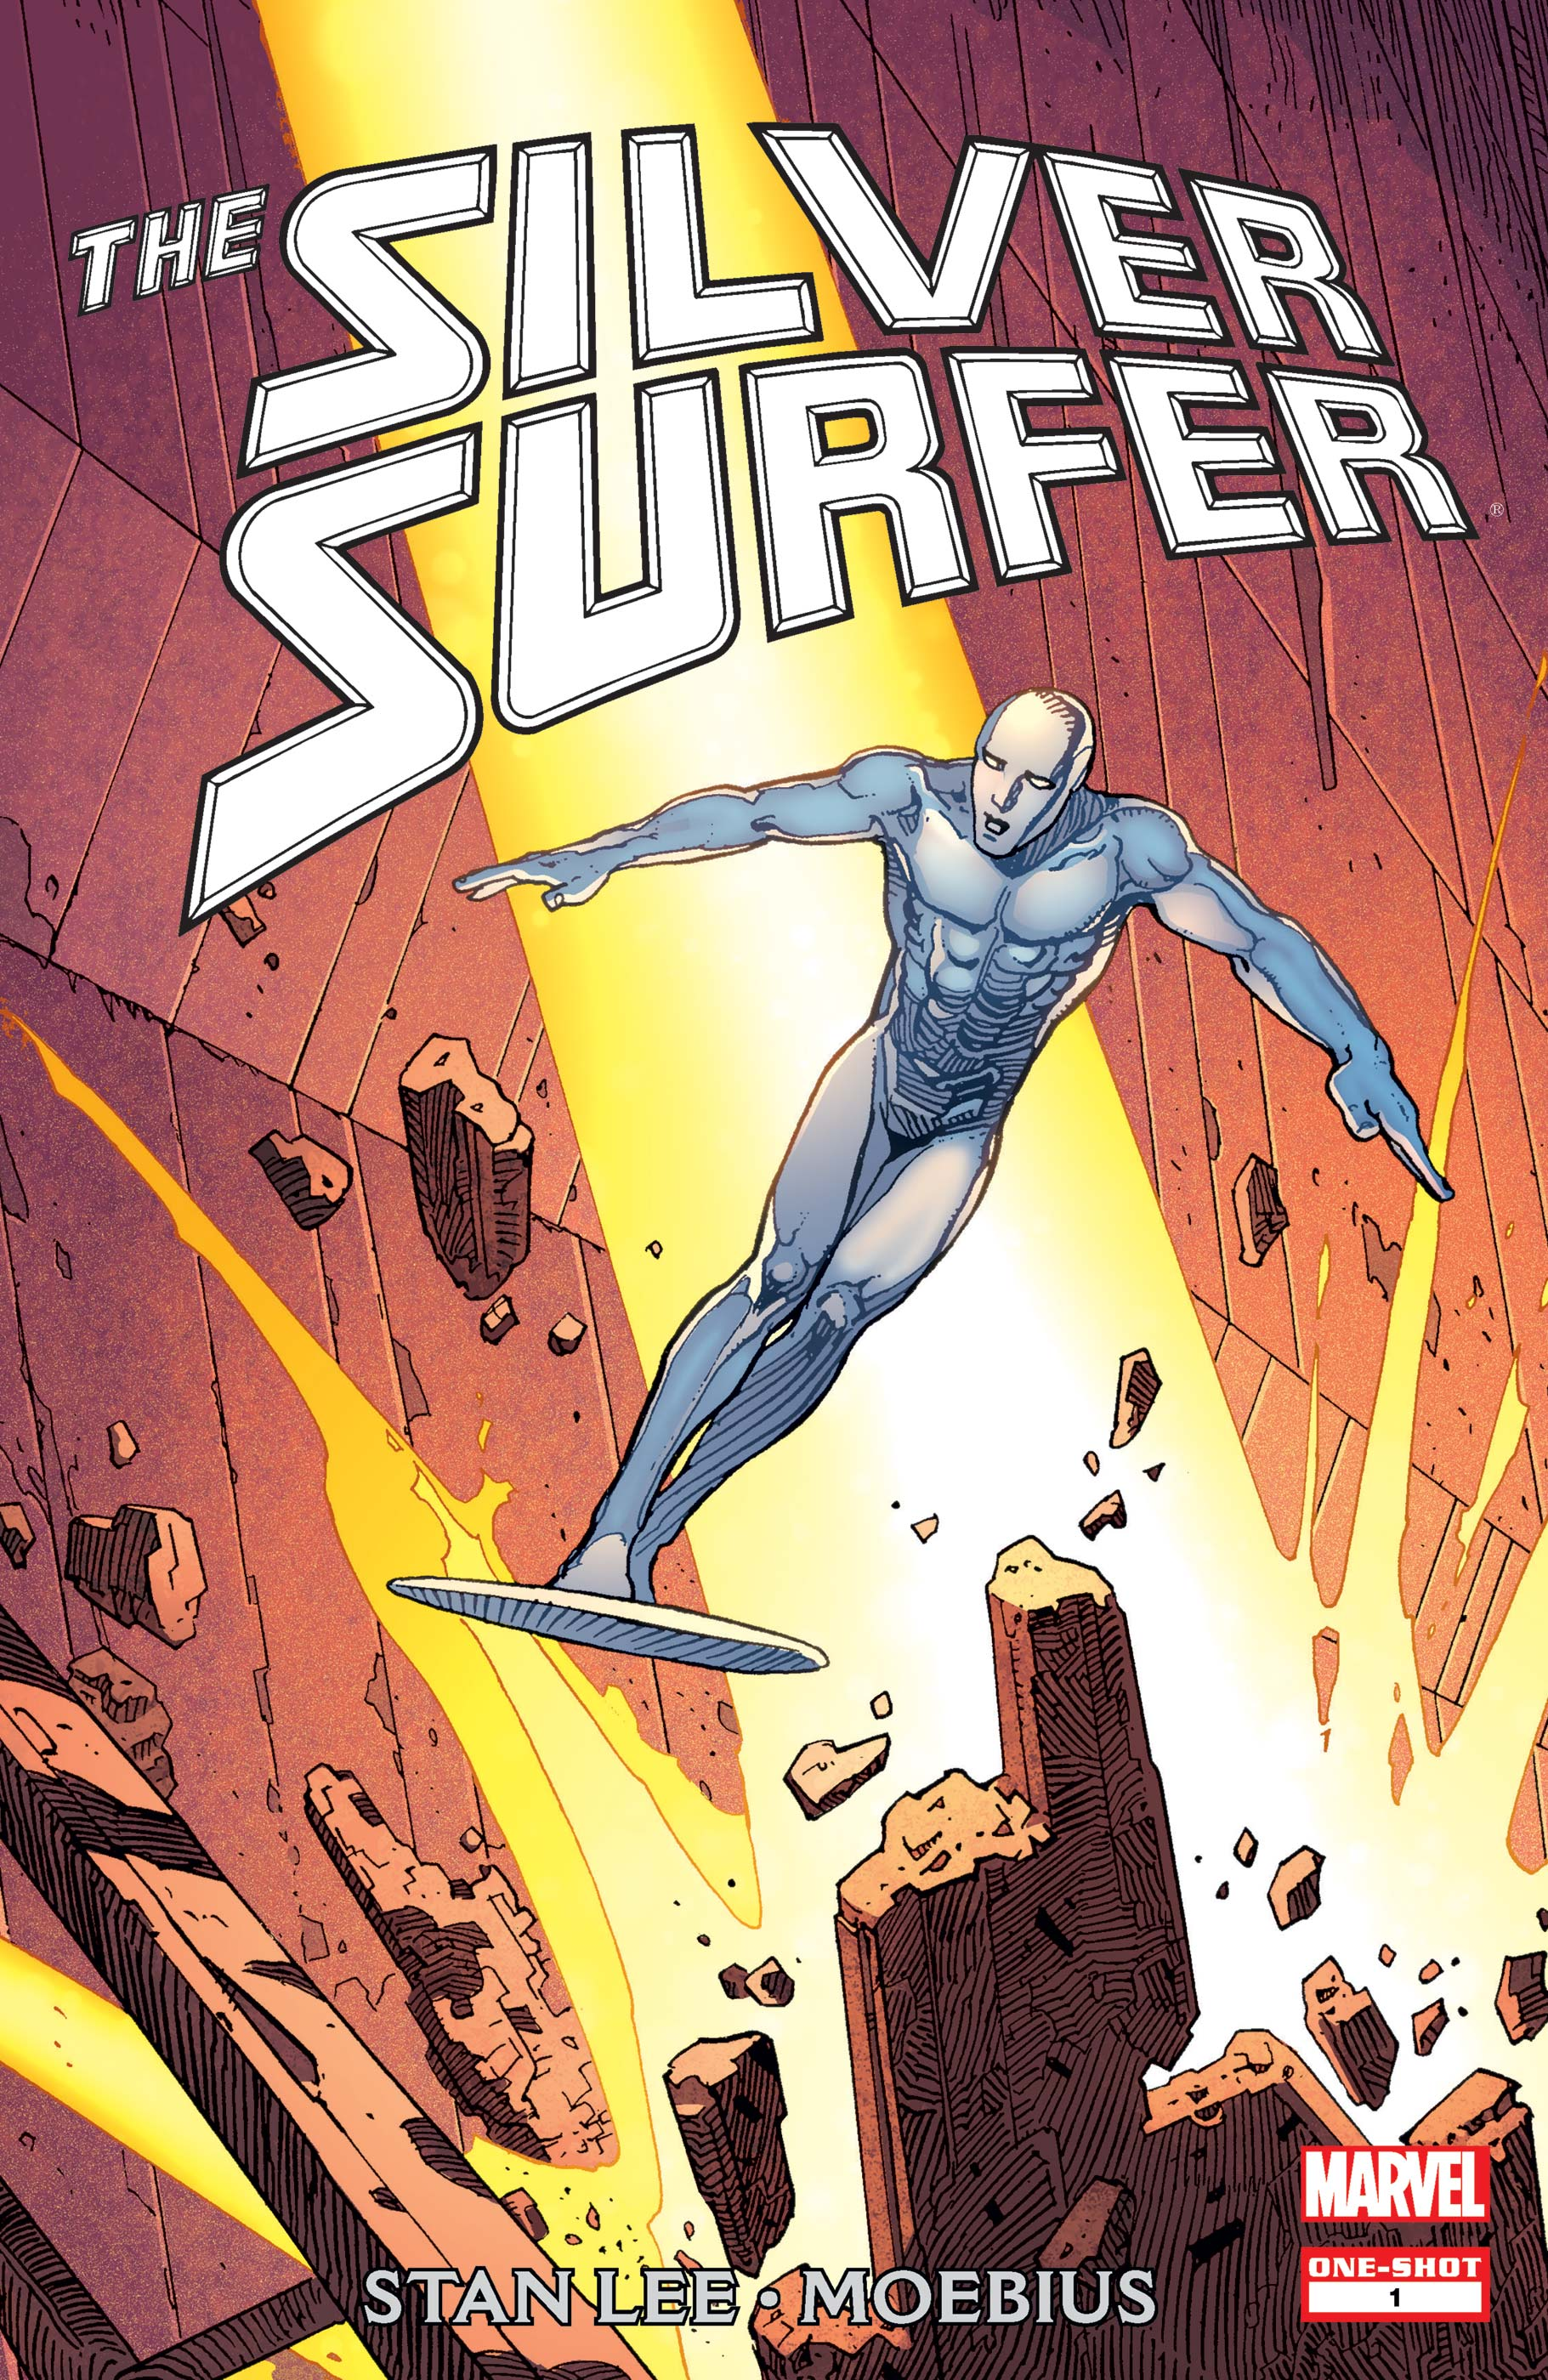 Silver Surfer by Stan Lee & Moebius (2013) #1